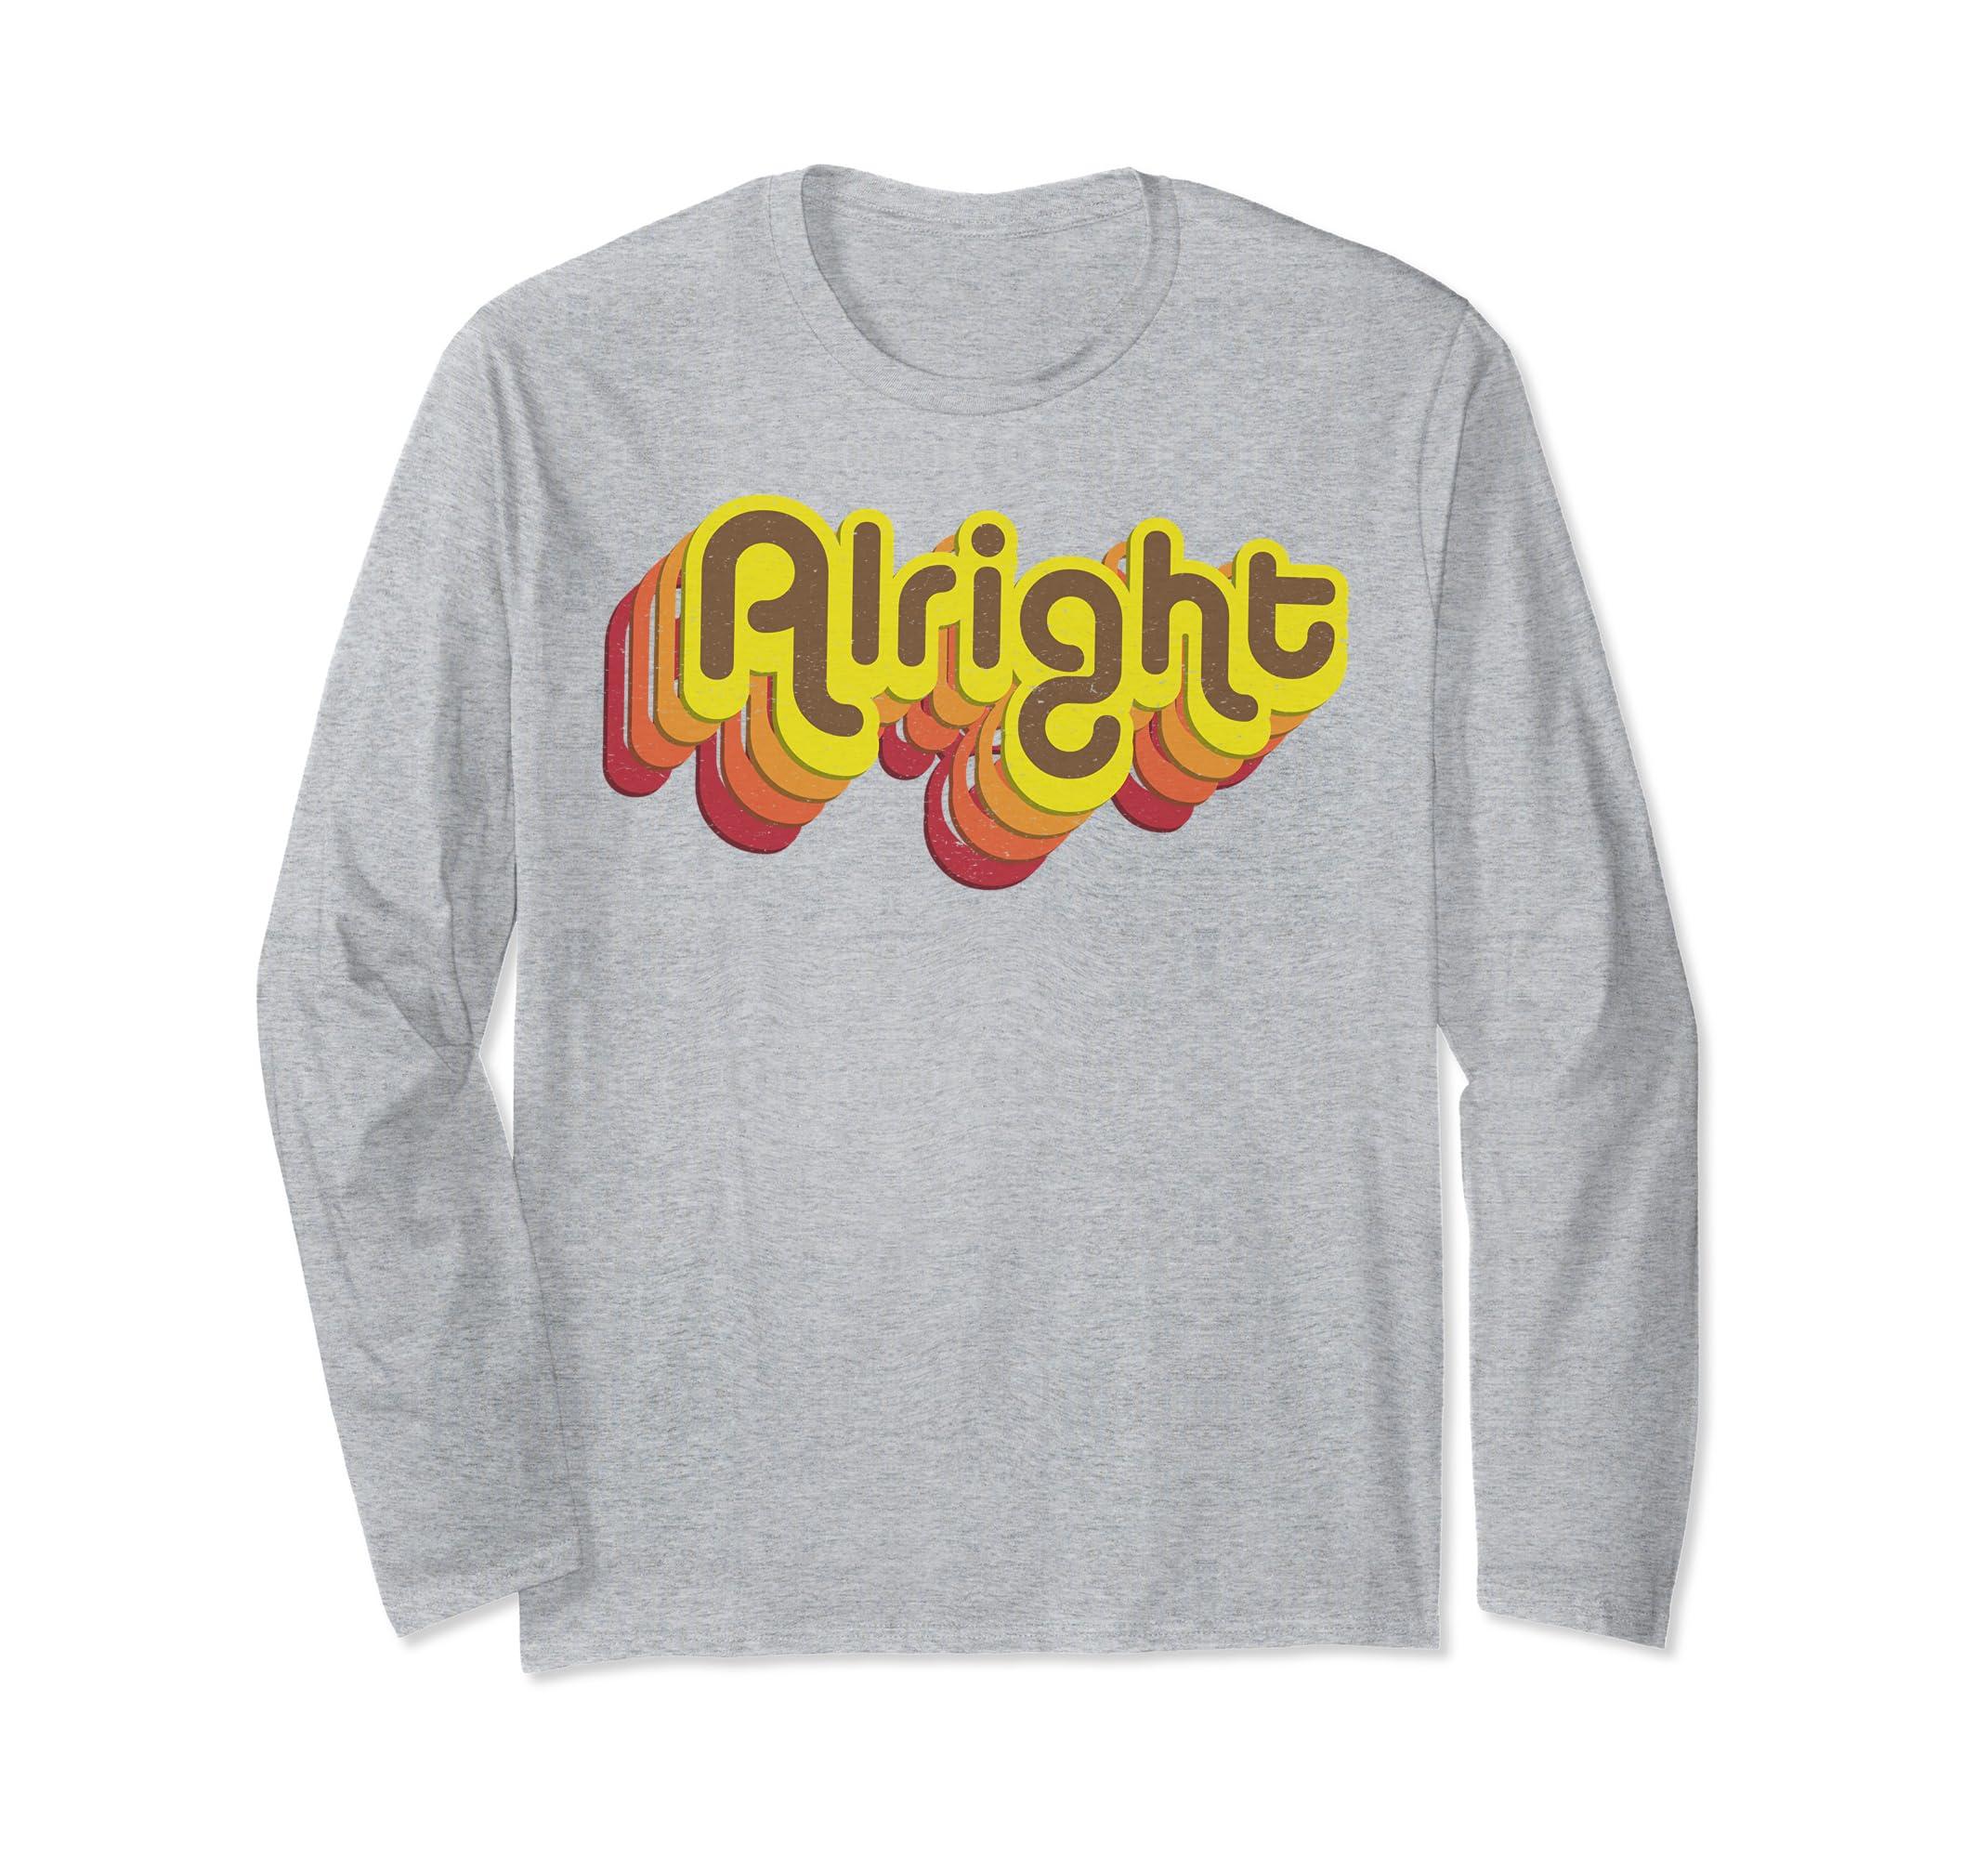 Alright Alright Longsleeve Shirt Retro 70s Long Sleeve Tee-ln